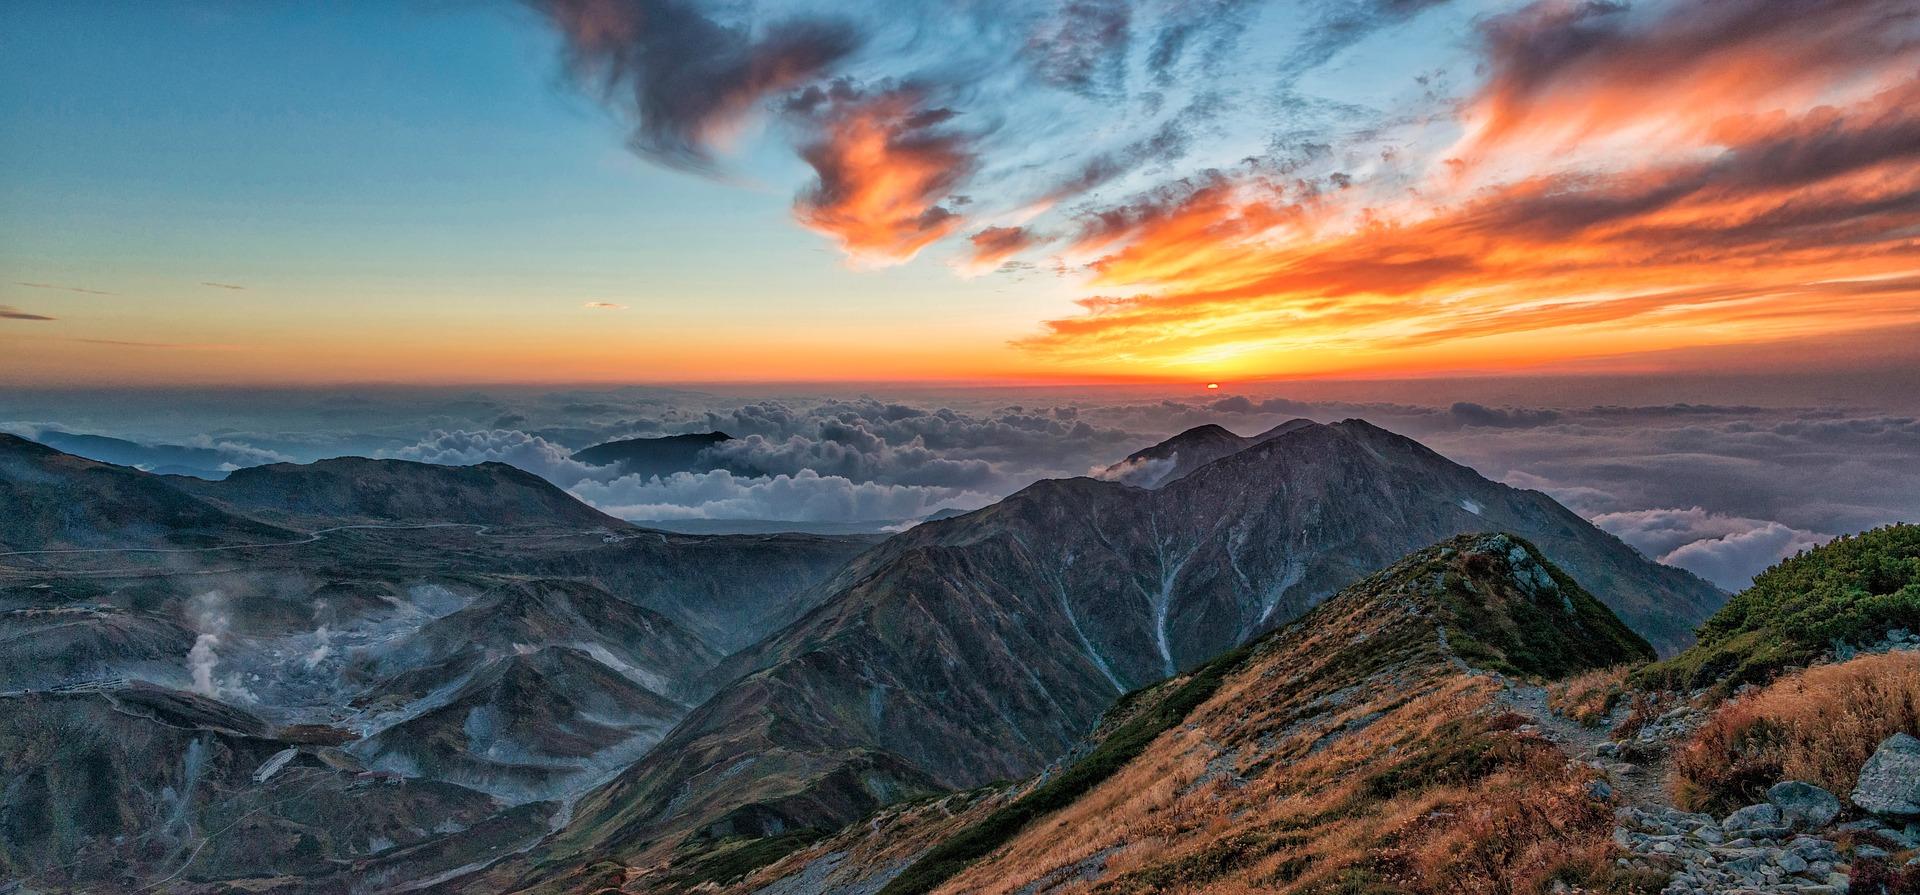 Wallpaper Mountains, landscape, sunset, nature, clouds